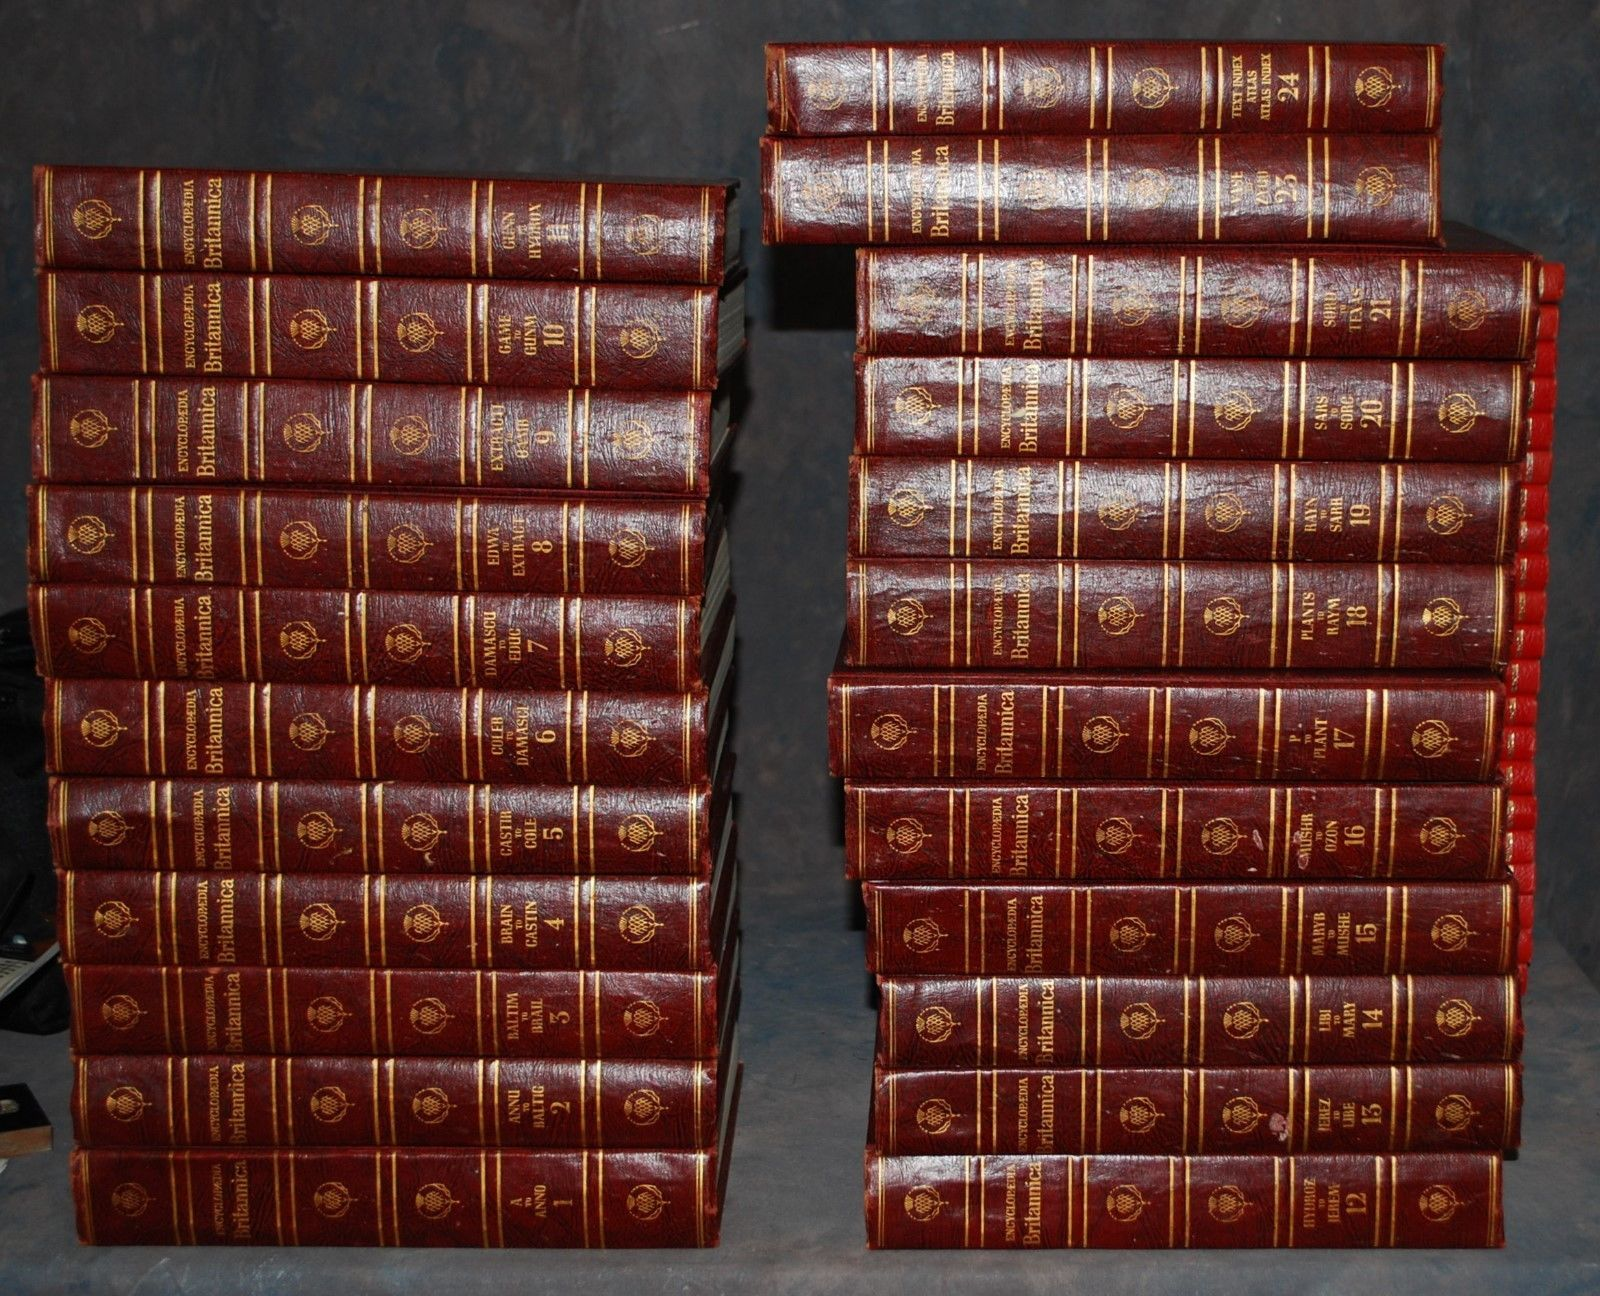 Encyclopedia Britannica Goes Fully Digital - Finding Napoleon